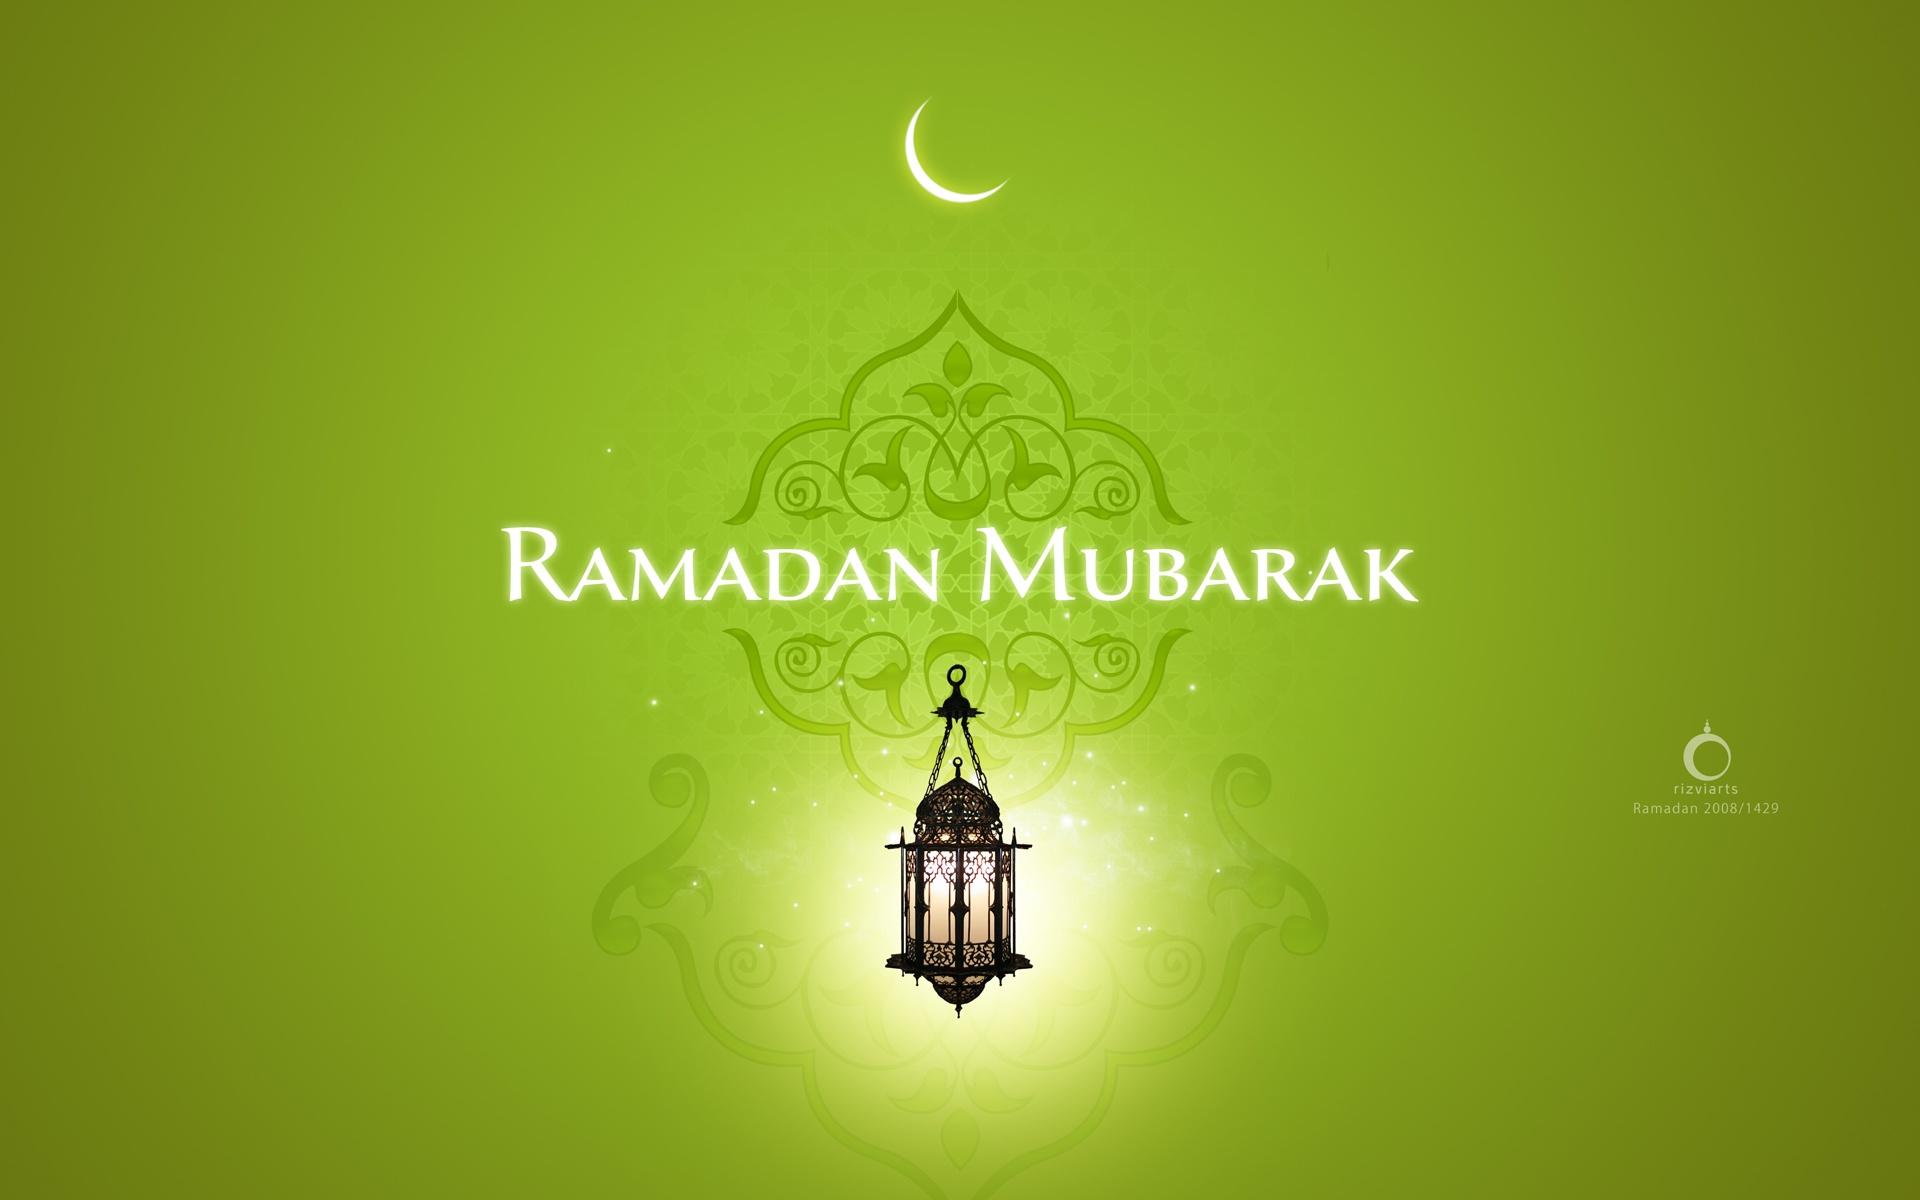 Ramadan Eid Mubarak Wallpapers In Jpg Format For Free Download